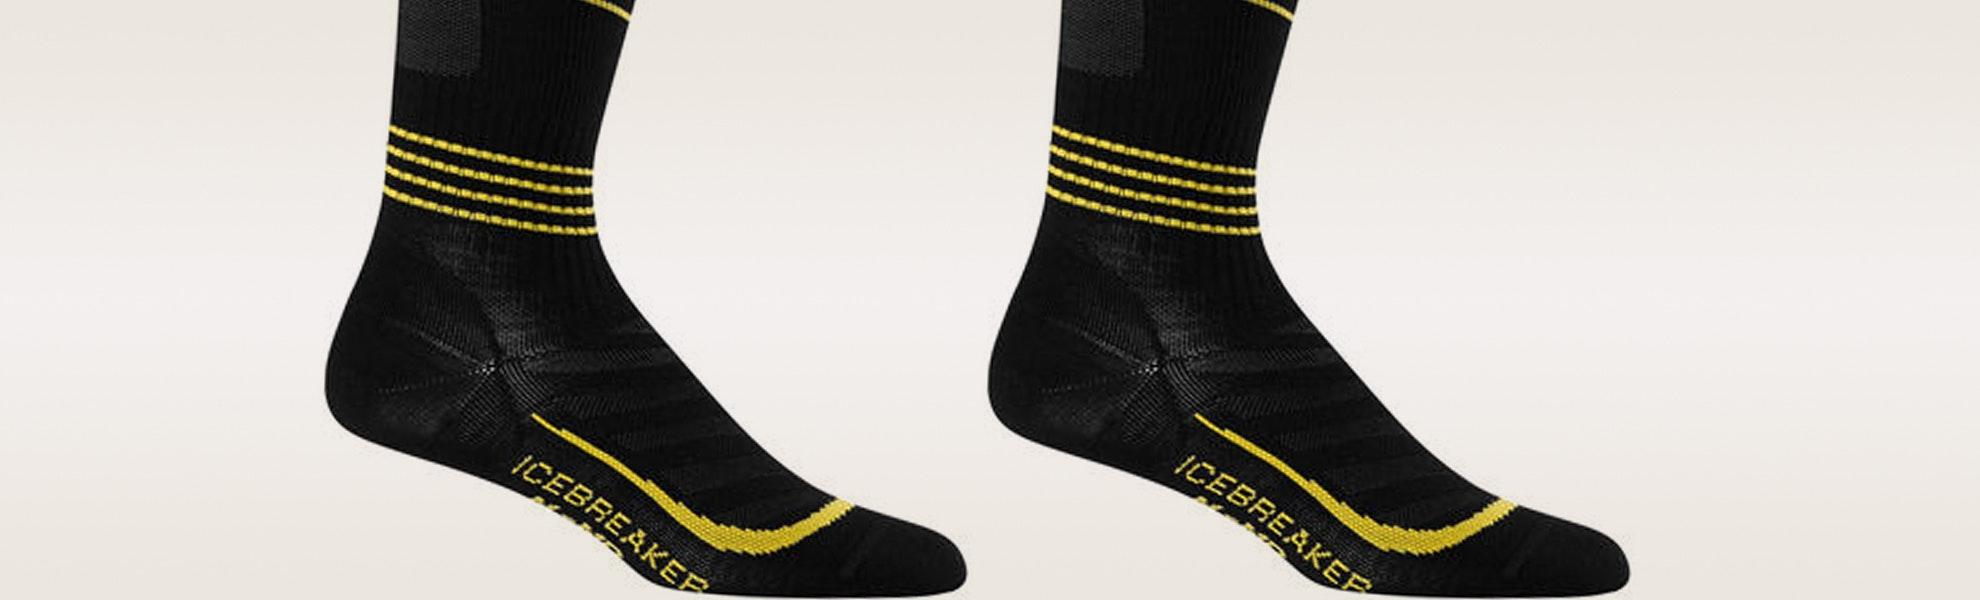 Icebreaker Run+ Ultra Light Compression Socks